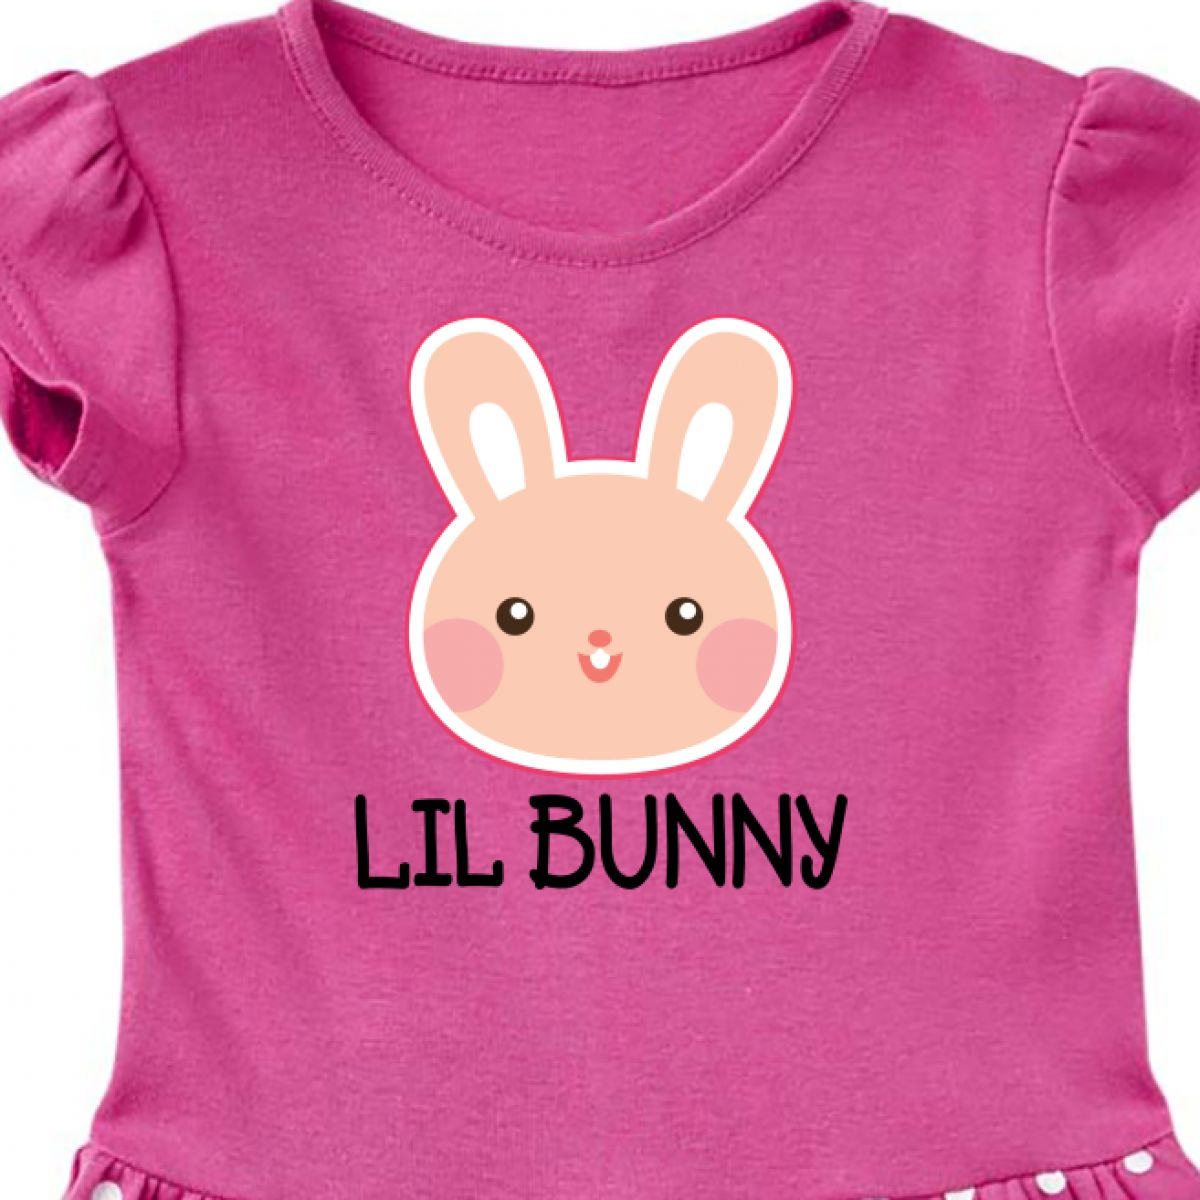 inktastic Easter Lil Bunny Girls Rabbit Toddler T-Shirt